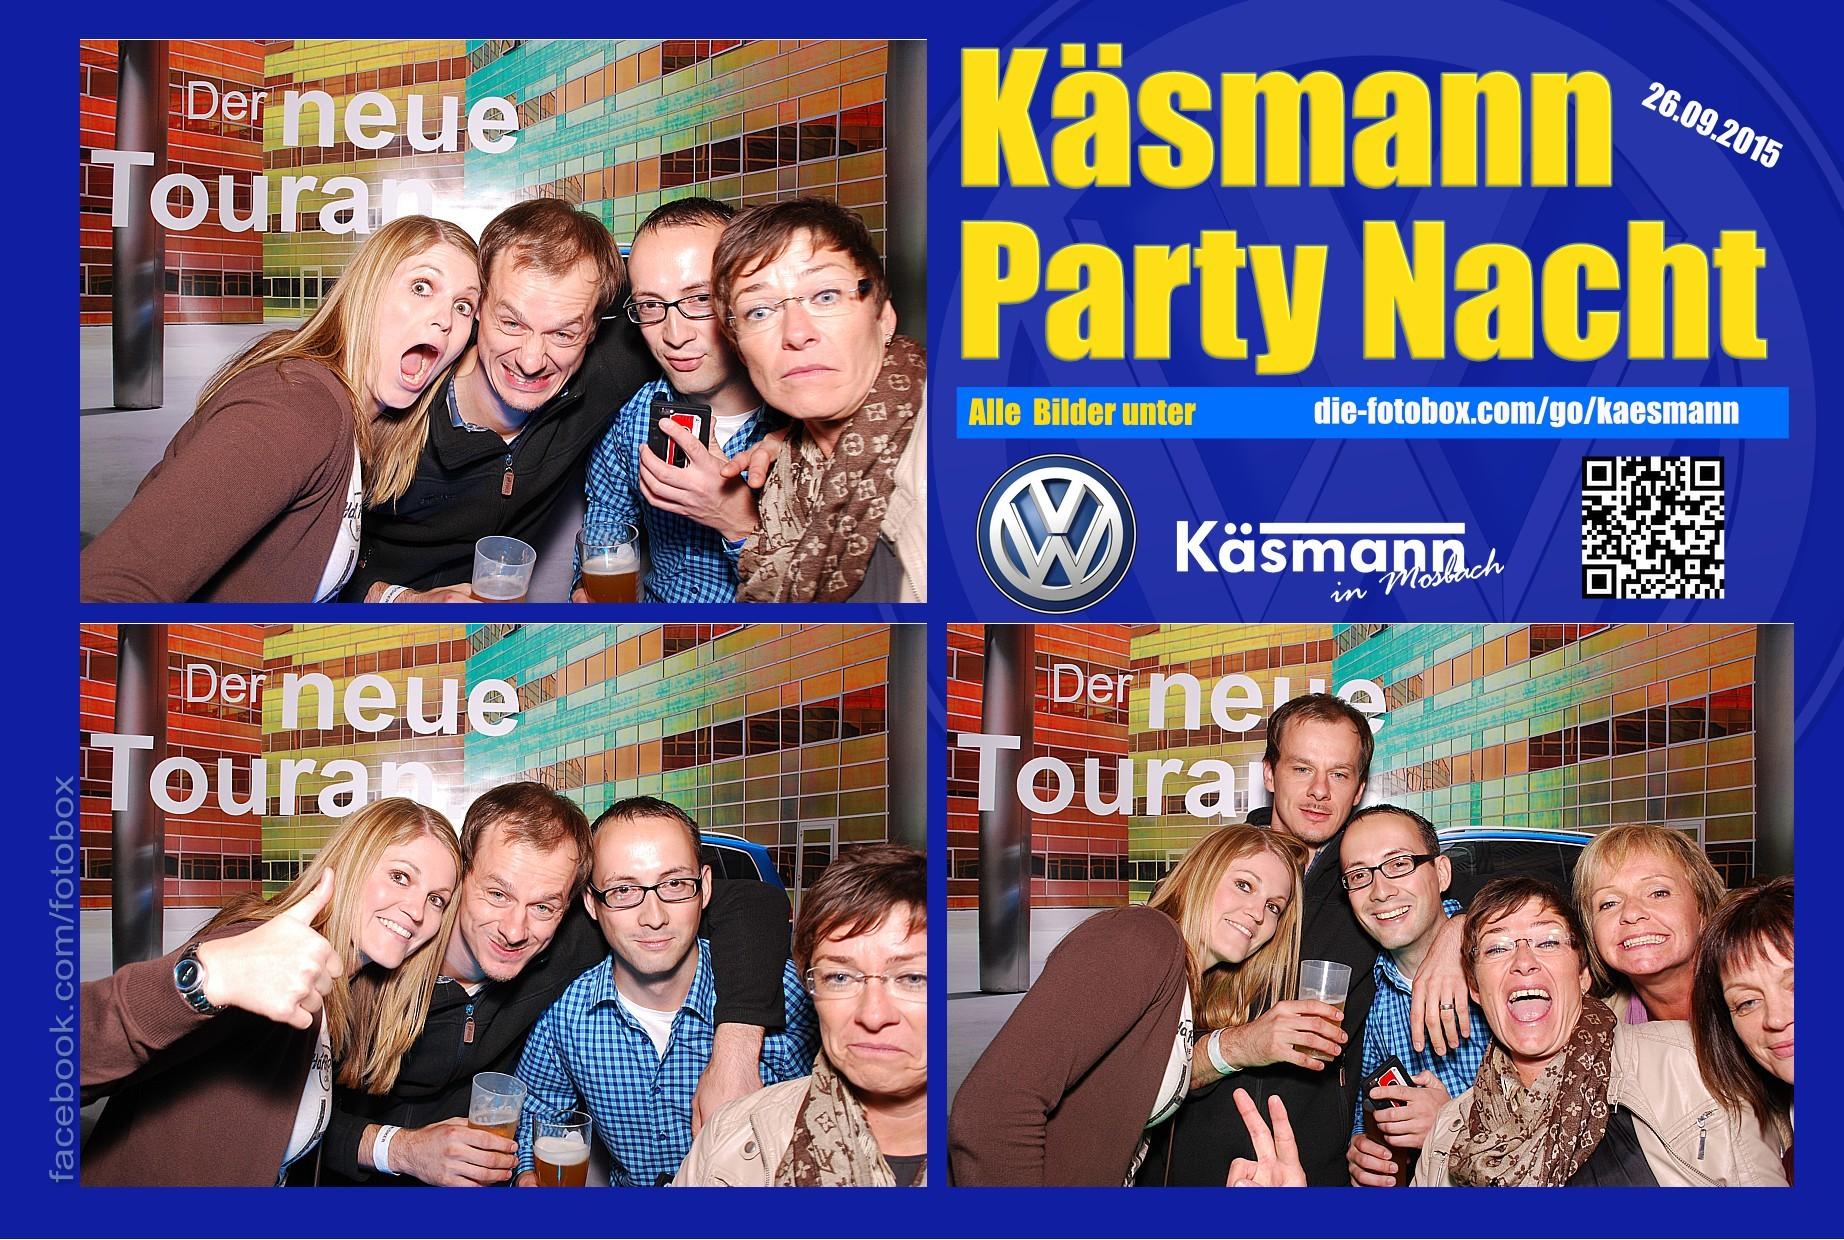 Käsmannparty 2015 - www.die-fotobox.com 01385